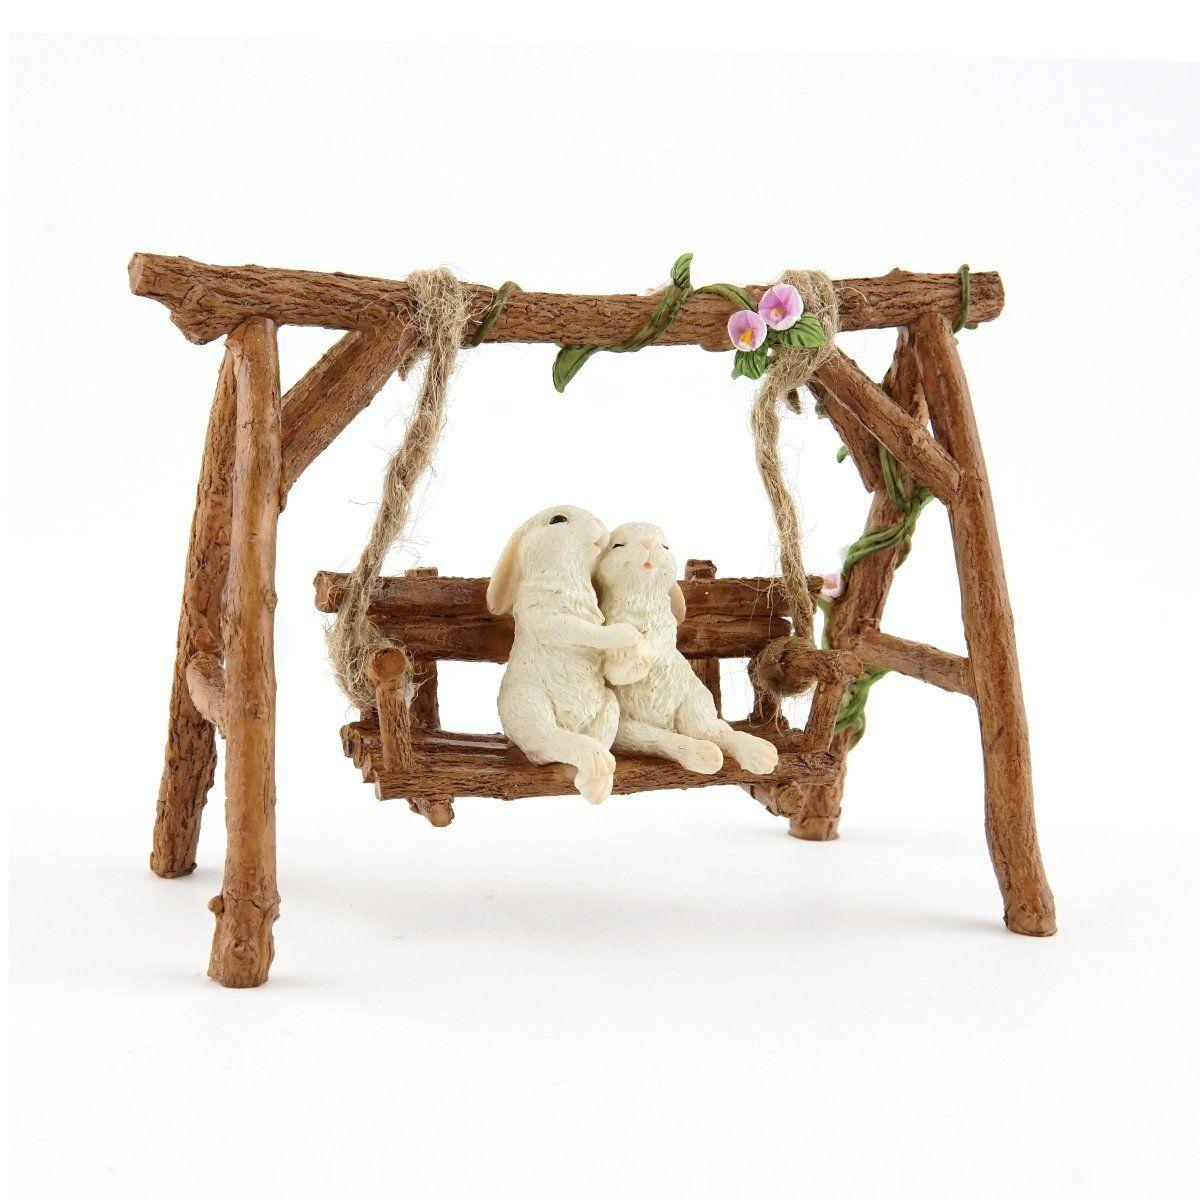 Wondrous Rabbit Lovers On Swinging Garden Bench Products Fairy Evergreenethics Interior Chair Design Evergreenethicsorg